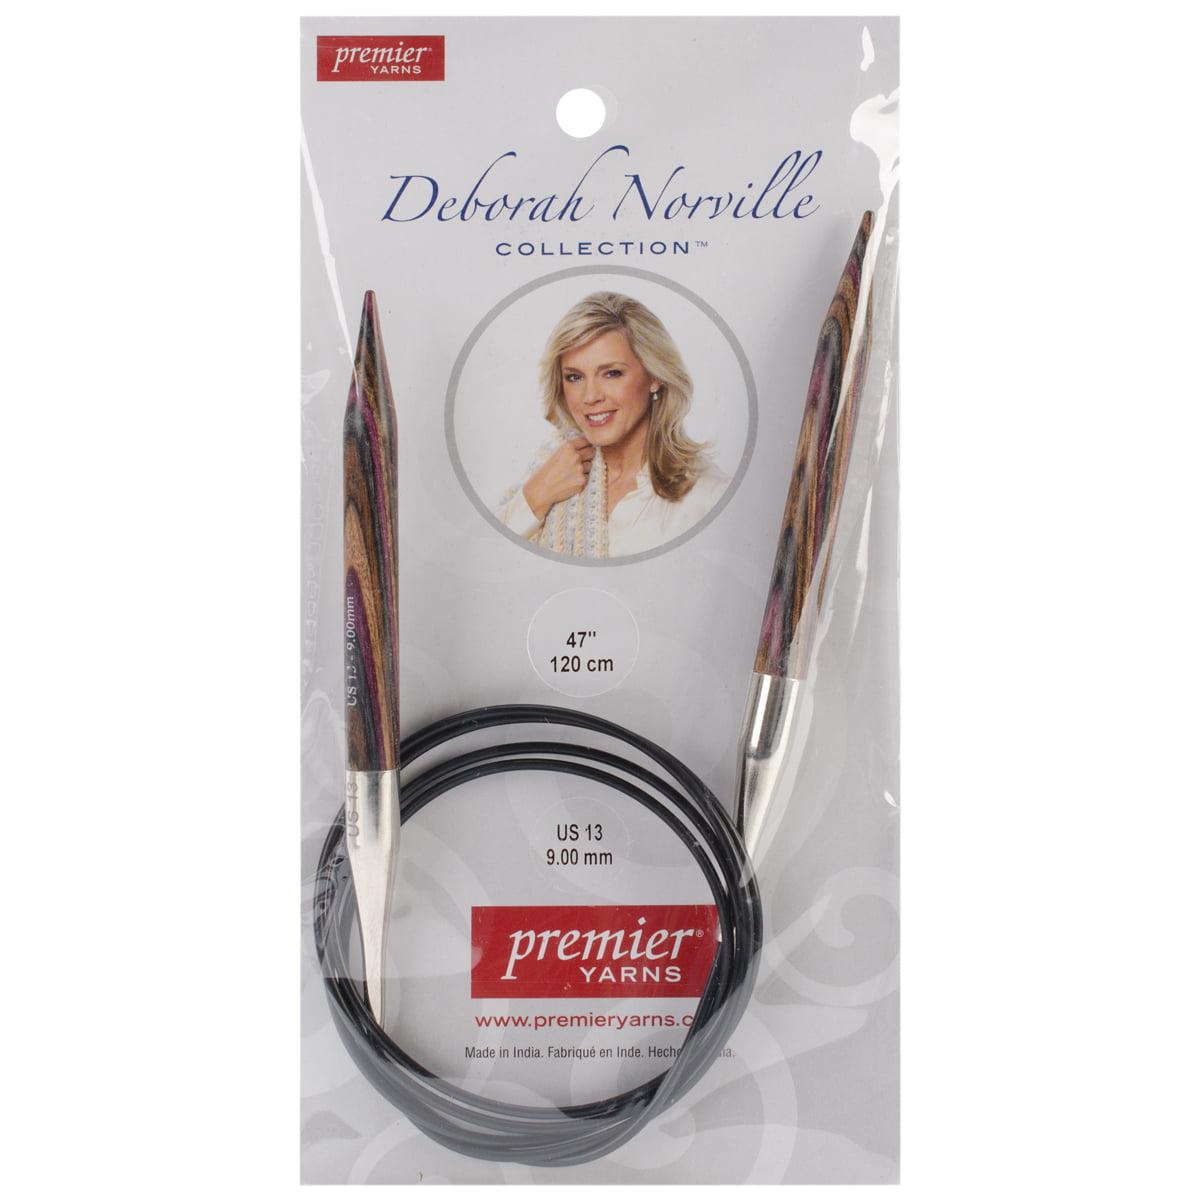 Premier Yarns Deborah Norville Fixed Circular Needles, 47-Inch, 13/9.0mm Multi-Colored